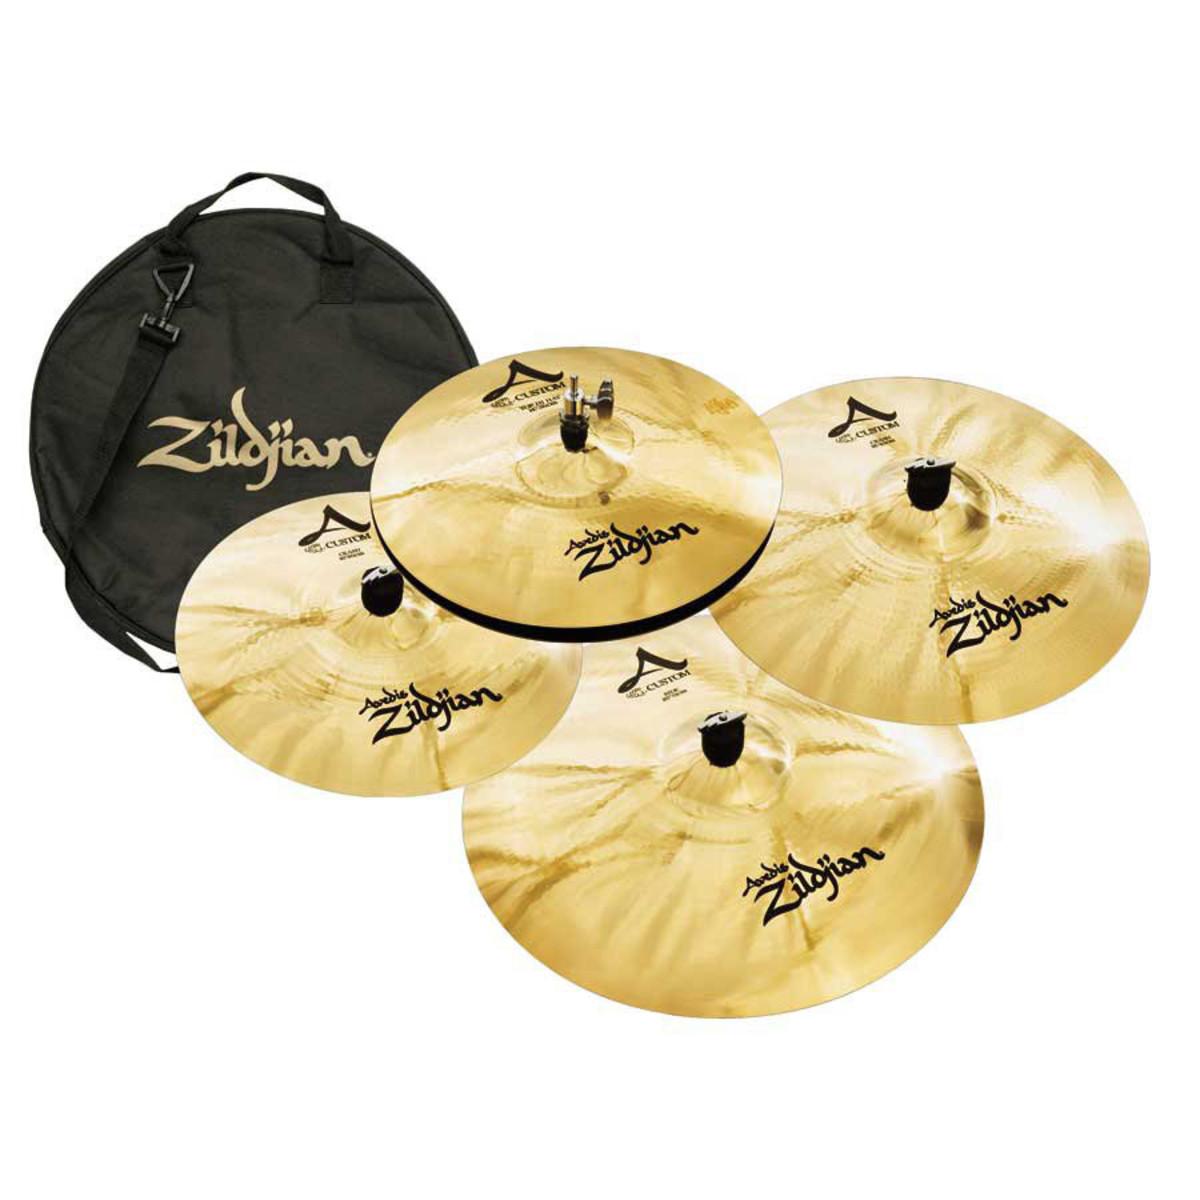 Modern Zildjian cymbals